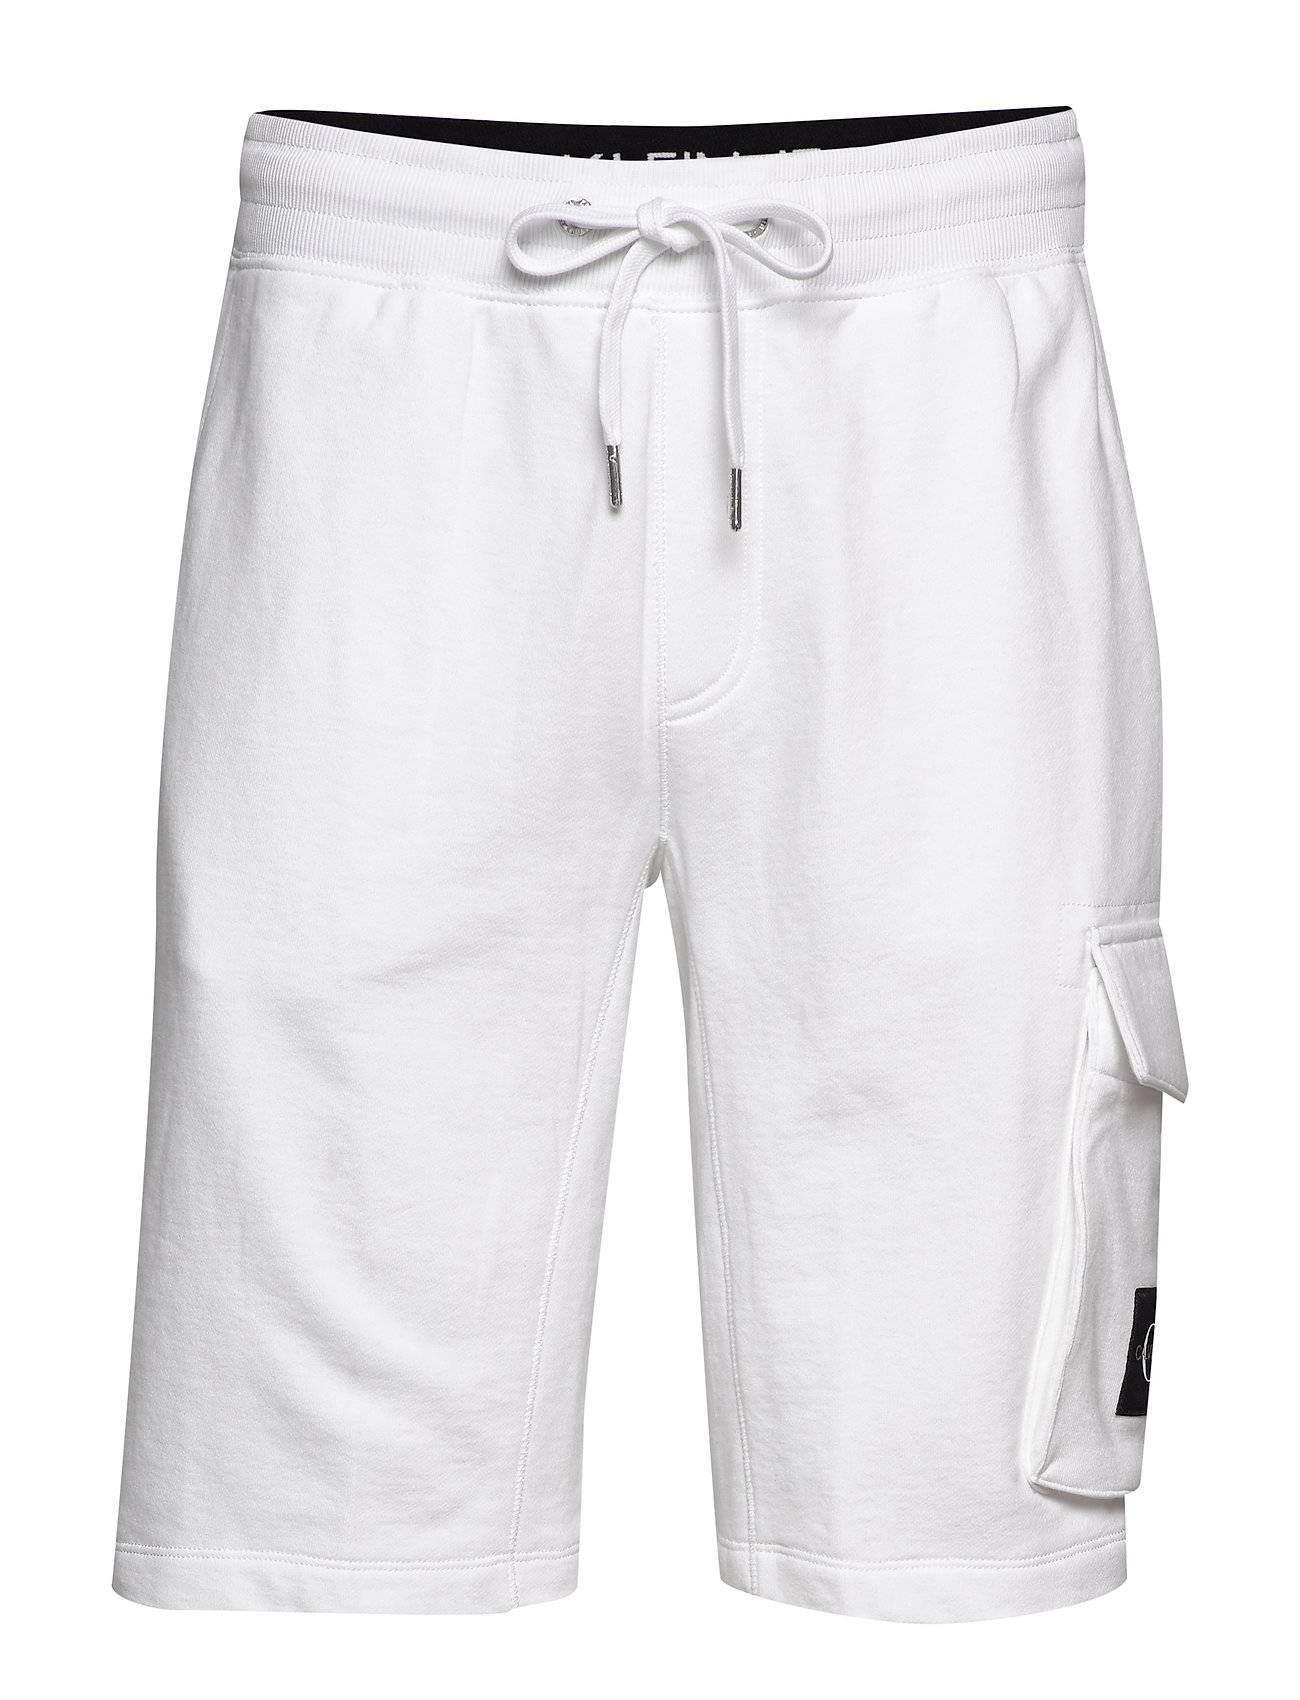 Image of Calvin Monogram Patch Hwk Short Shorts Casual Valkoinen